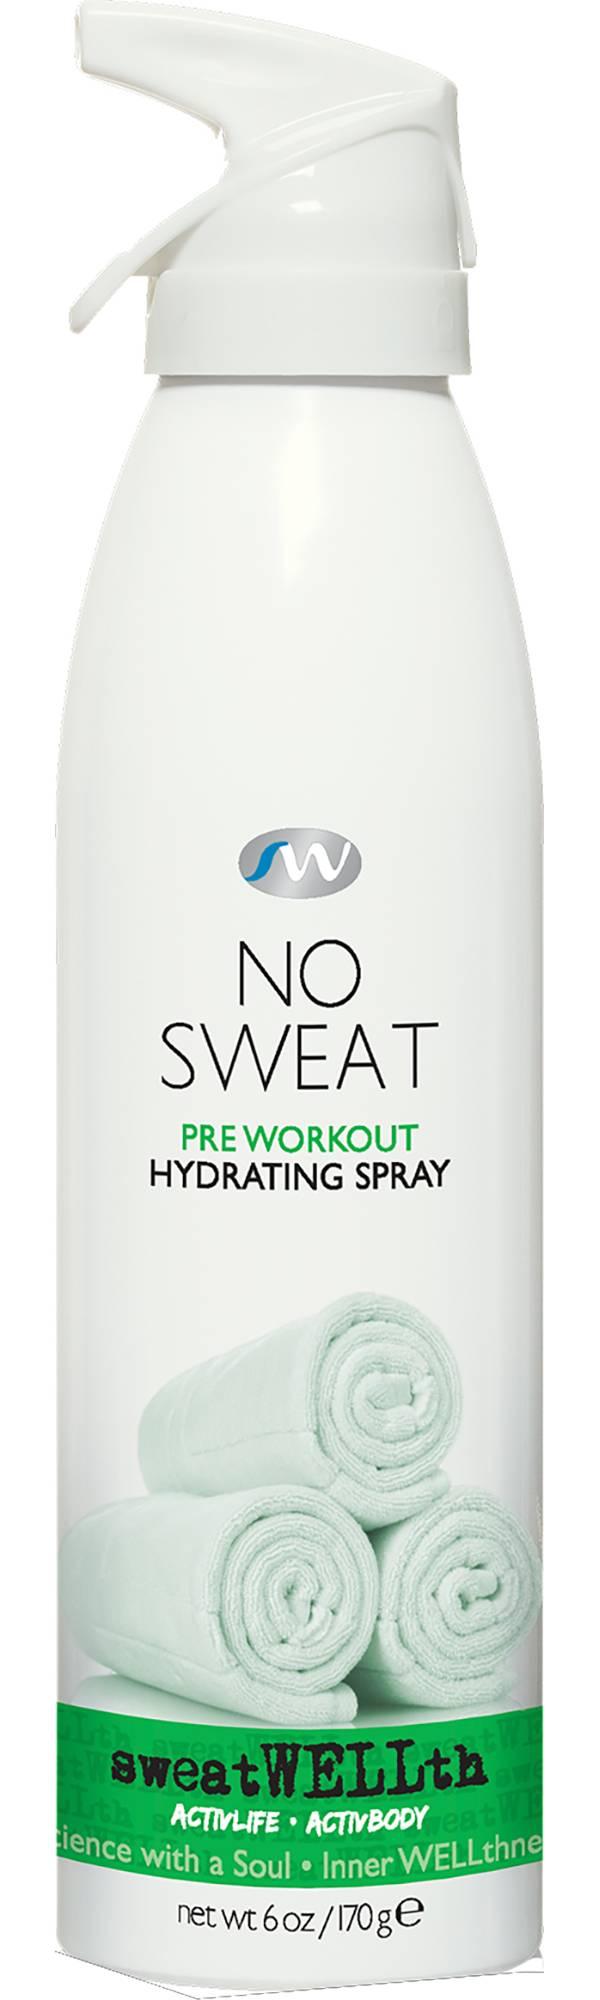 sweatWELLth No Sweat Hydrating Spray product image